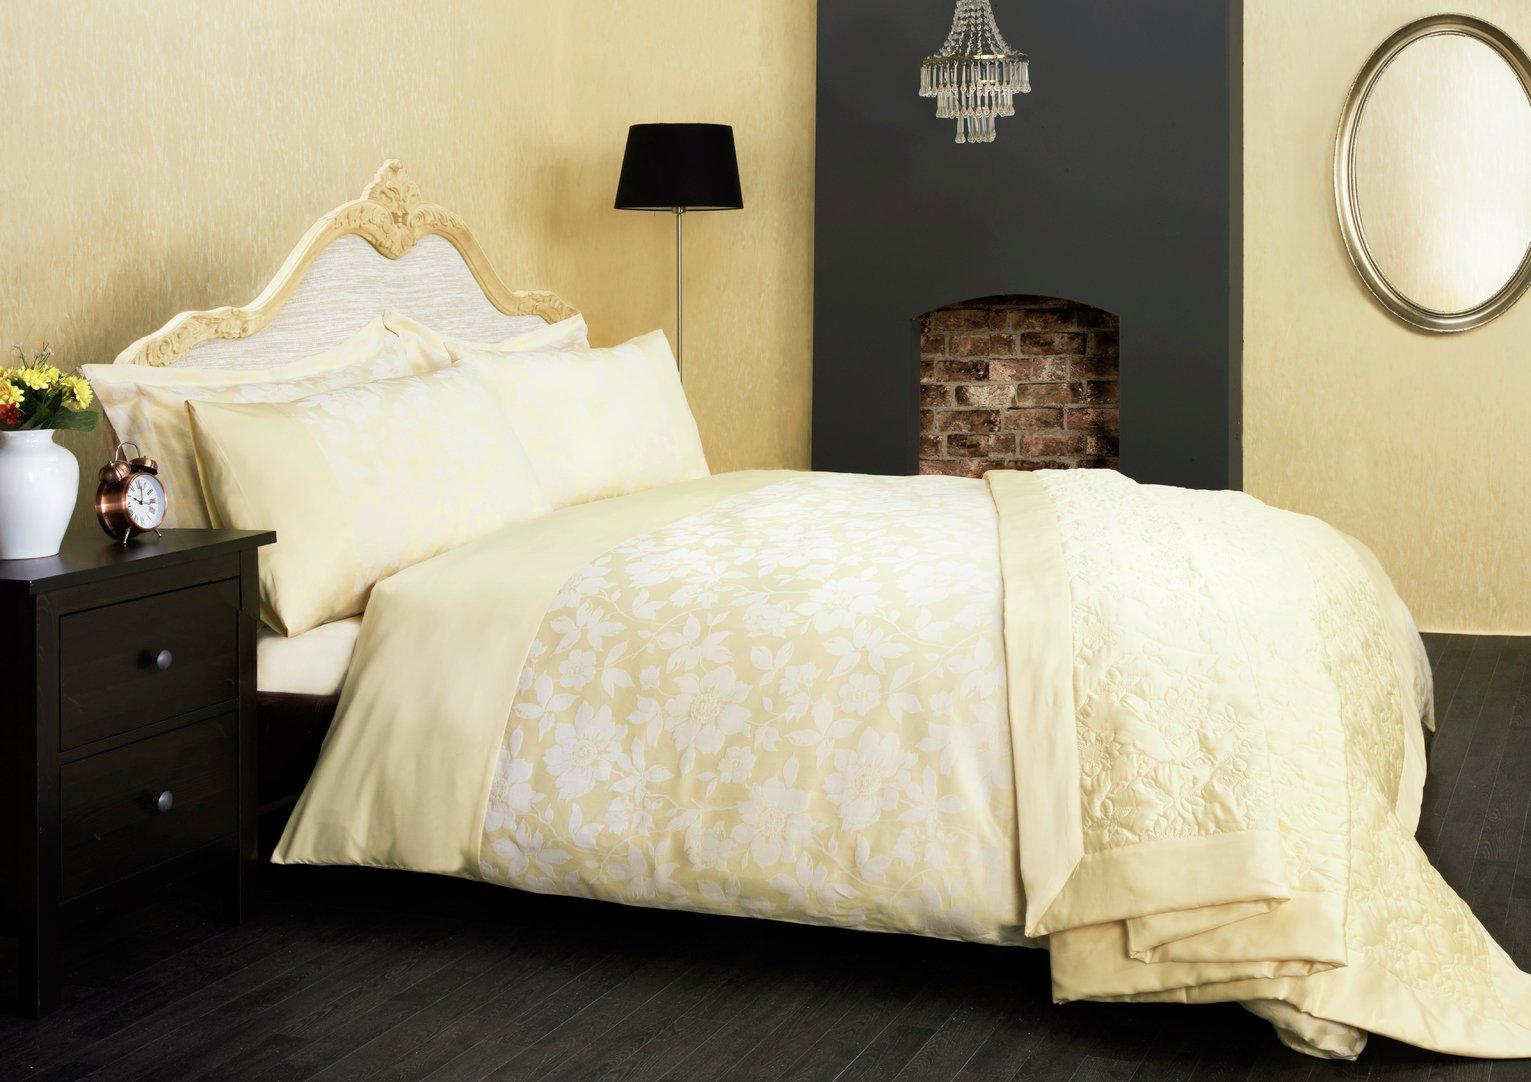 Julian Charles Lottie Lemon Pair of Oxford Pillowcases